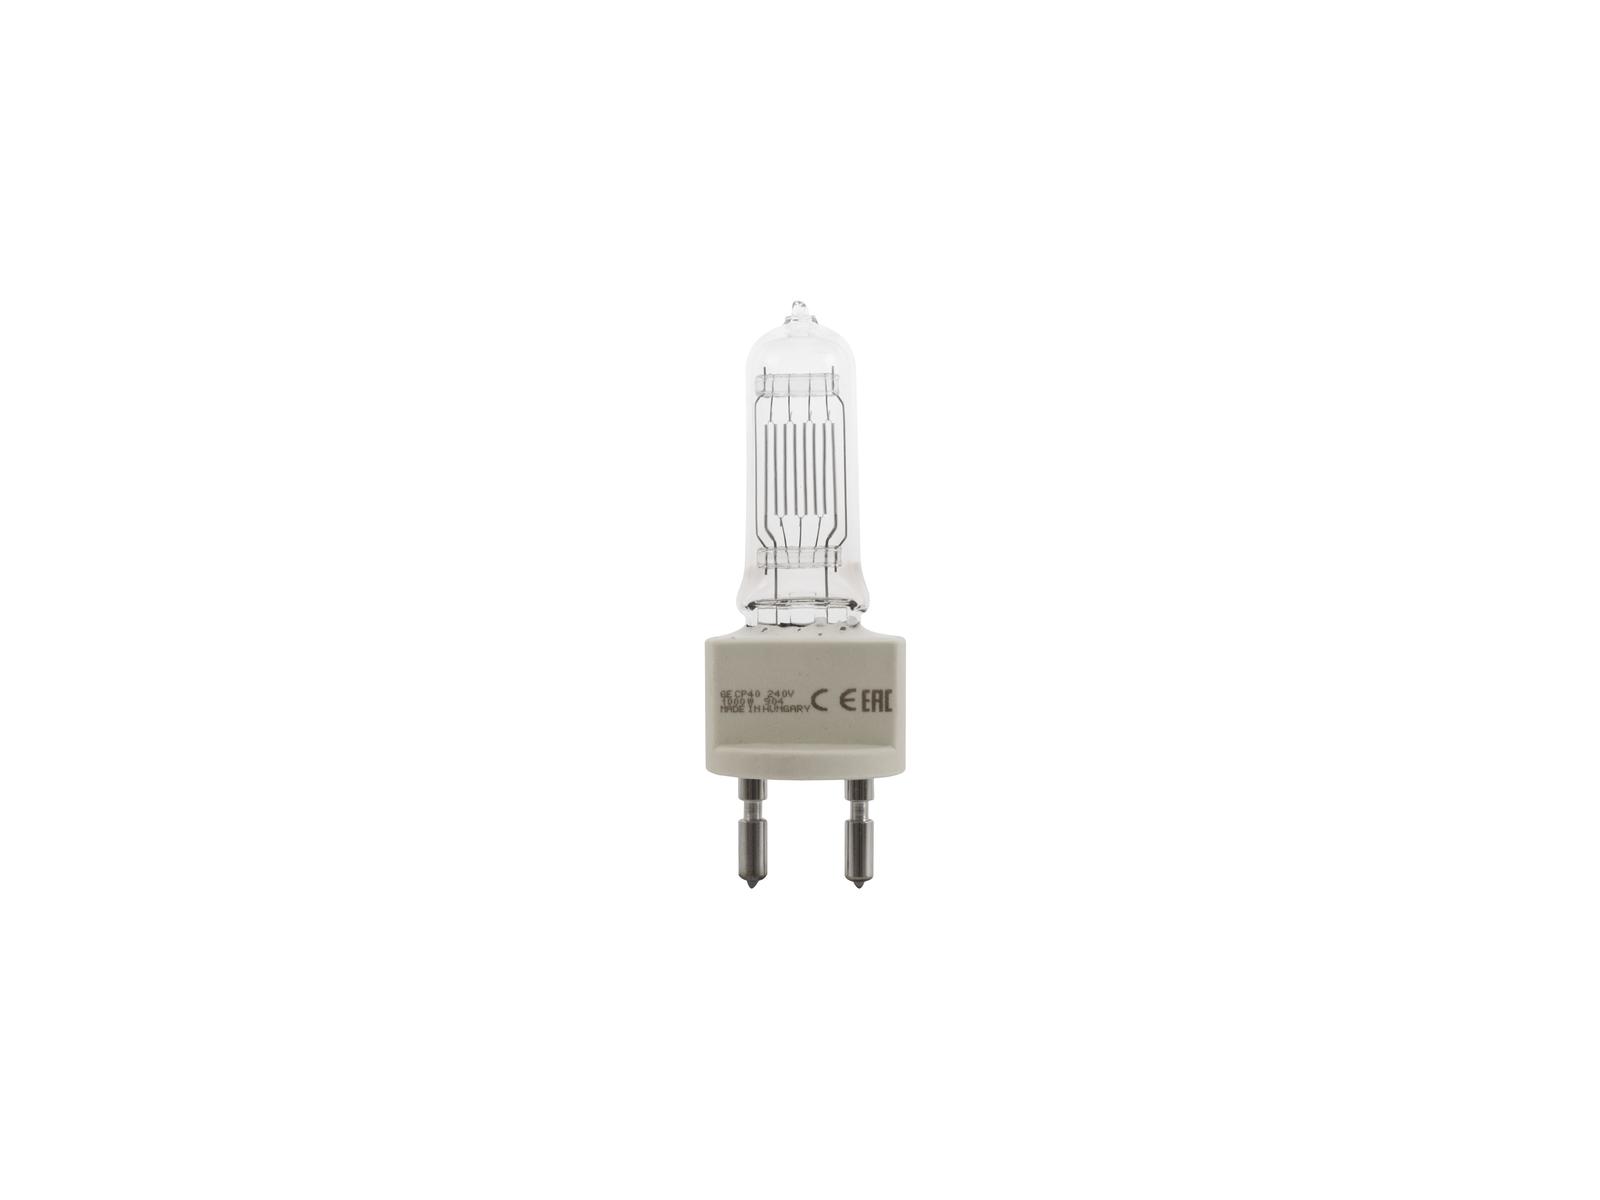 230V/1000W G-22 CP40 FKJ GE